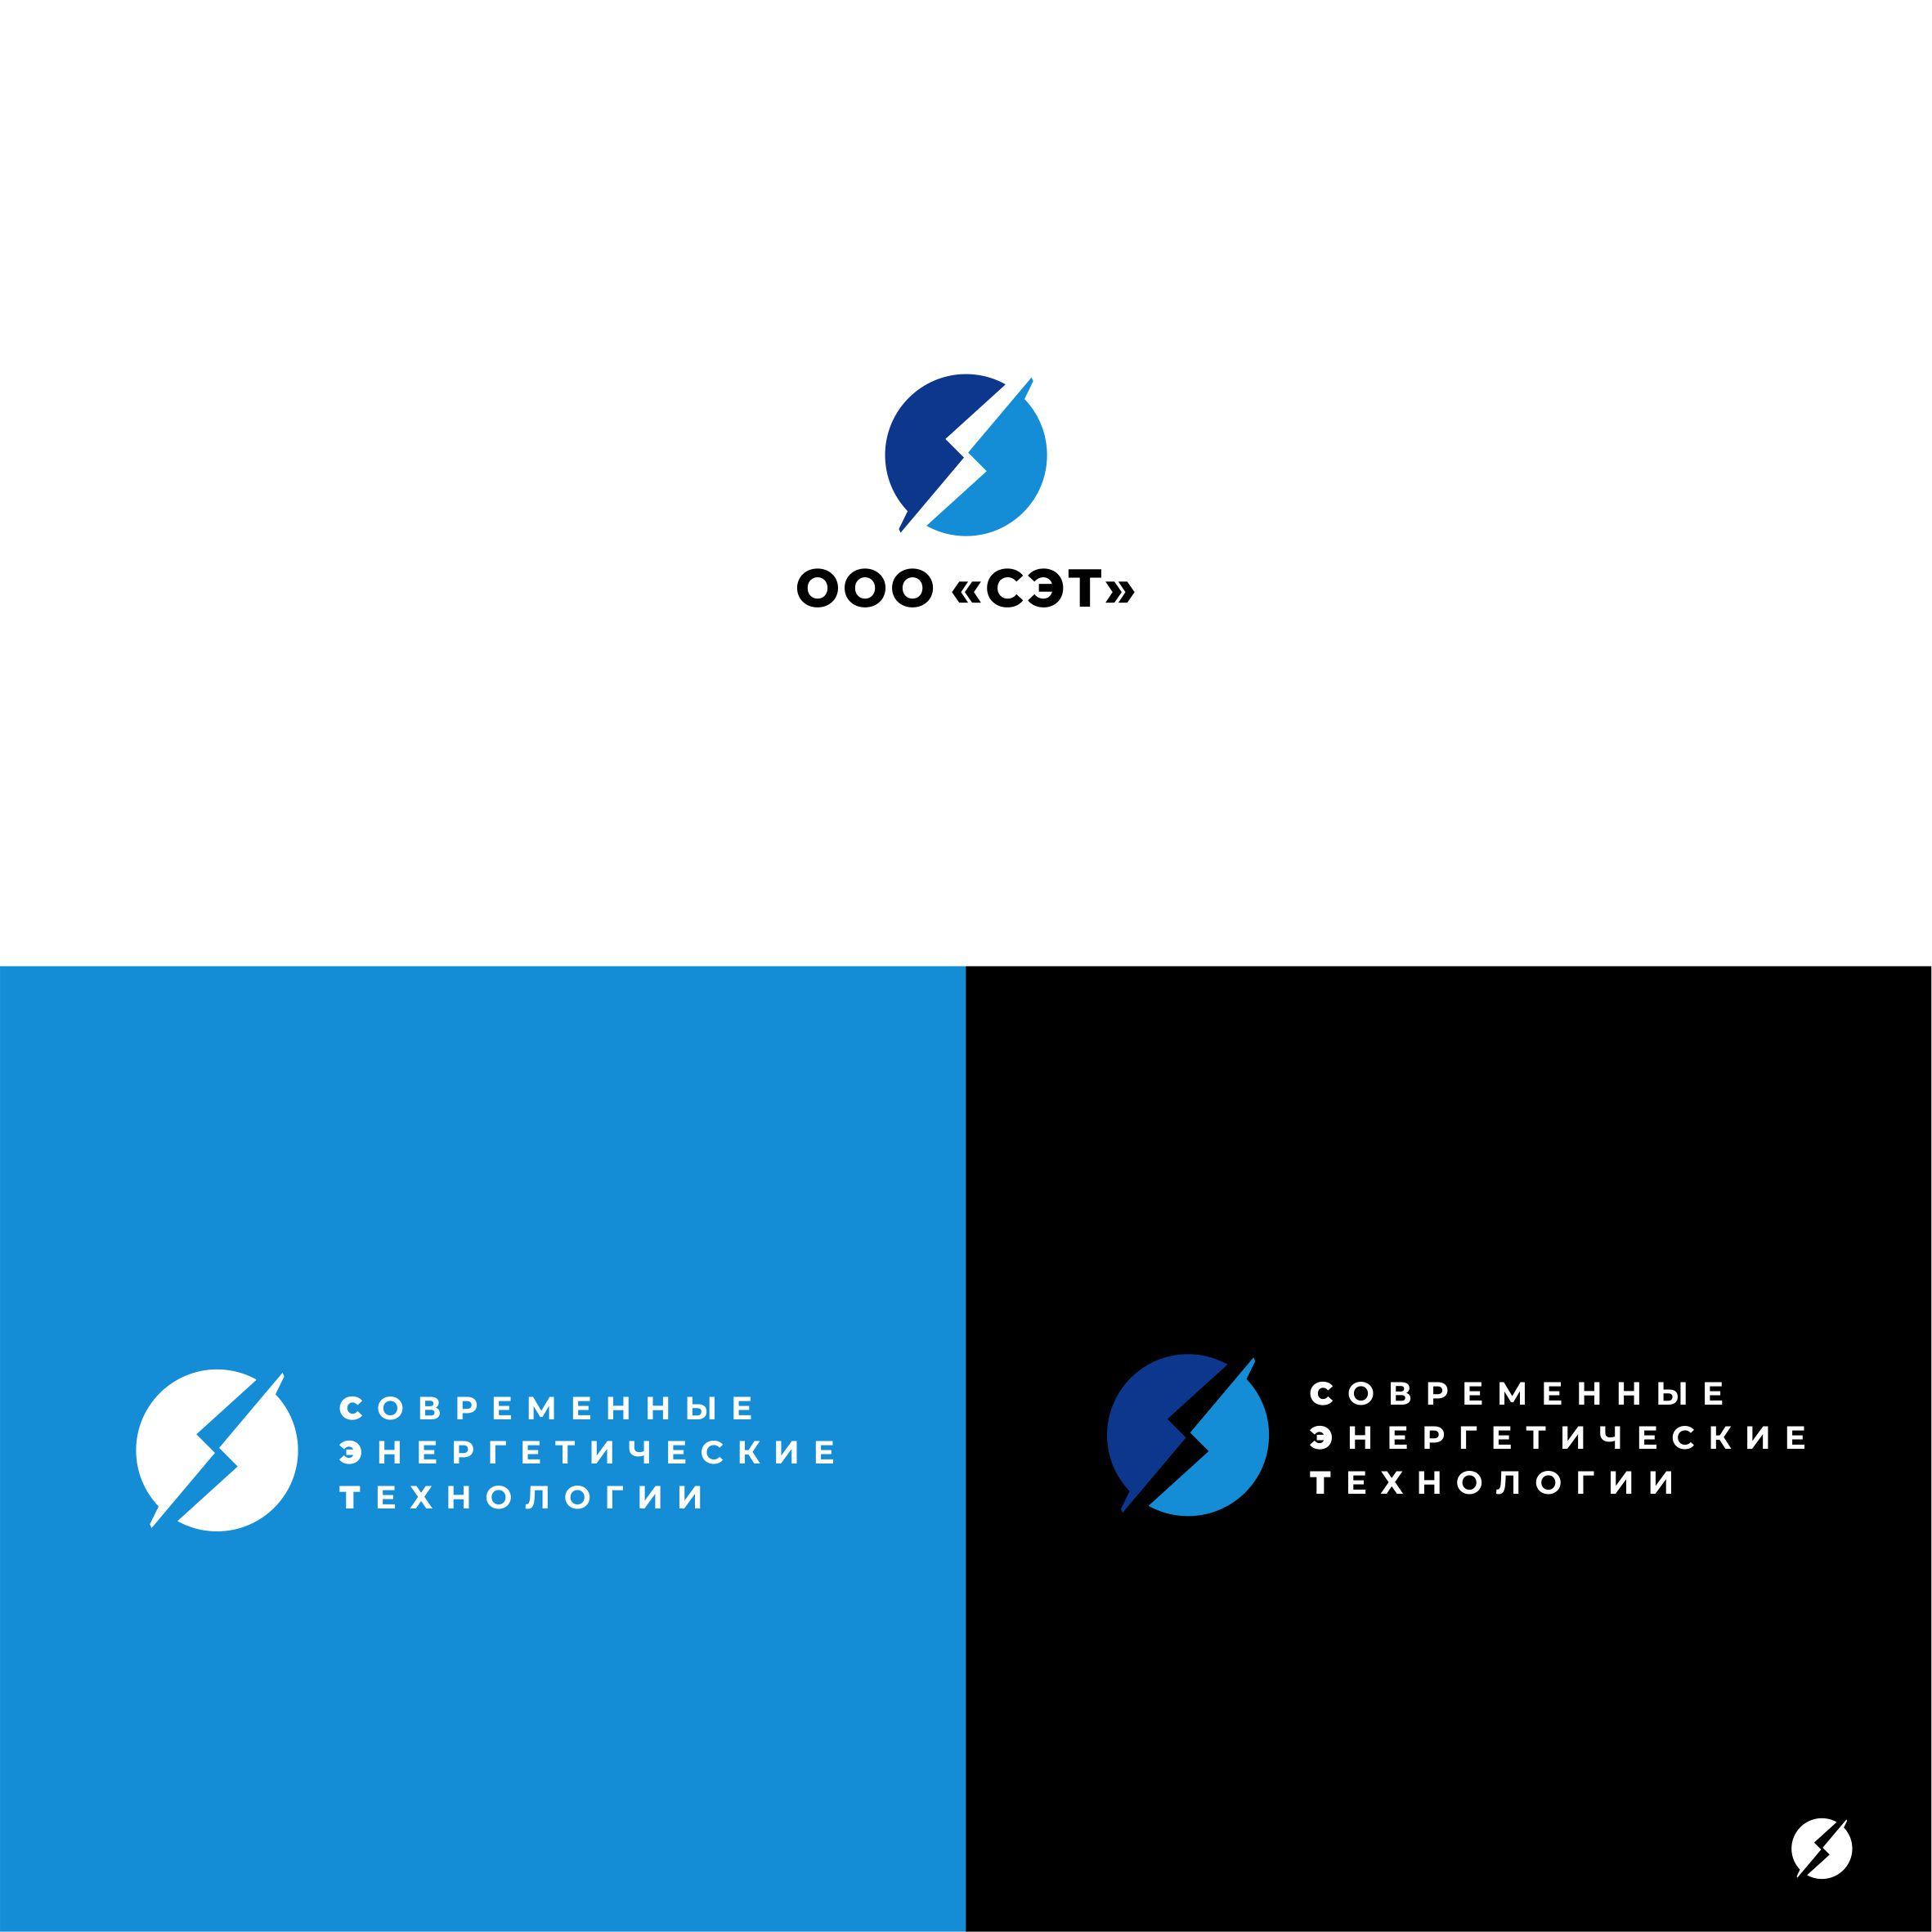 Срочно! Дизайн логотипа ООО «СЭТ» фото f_3395d4b398c76c80.jpg